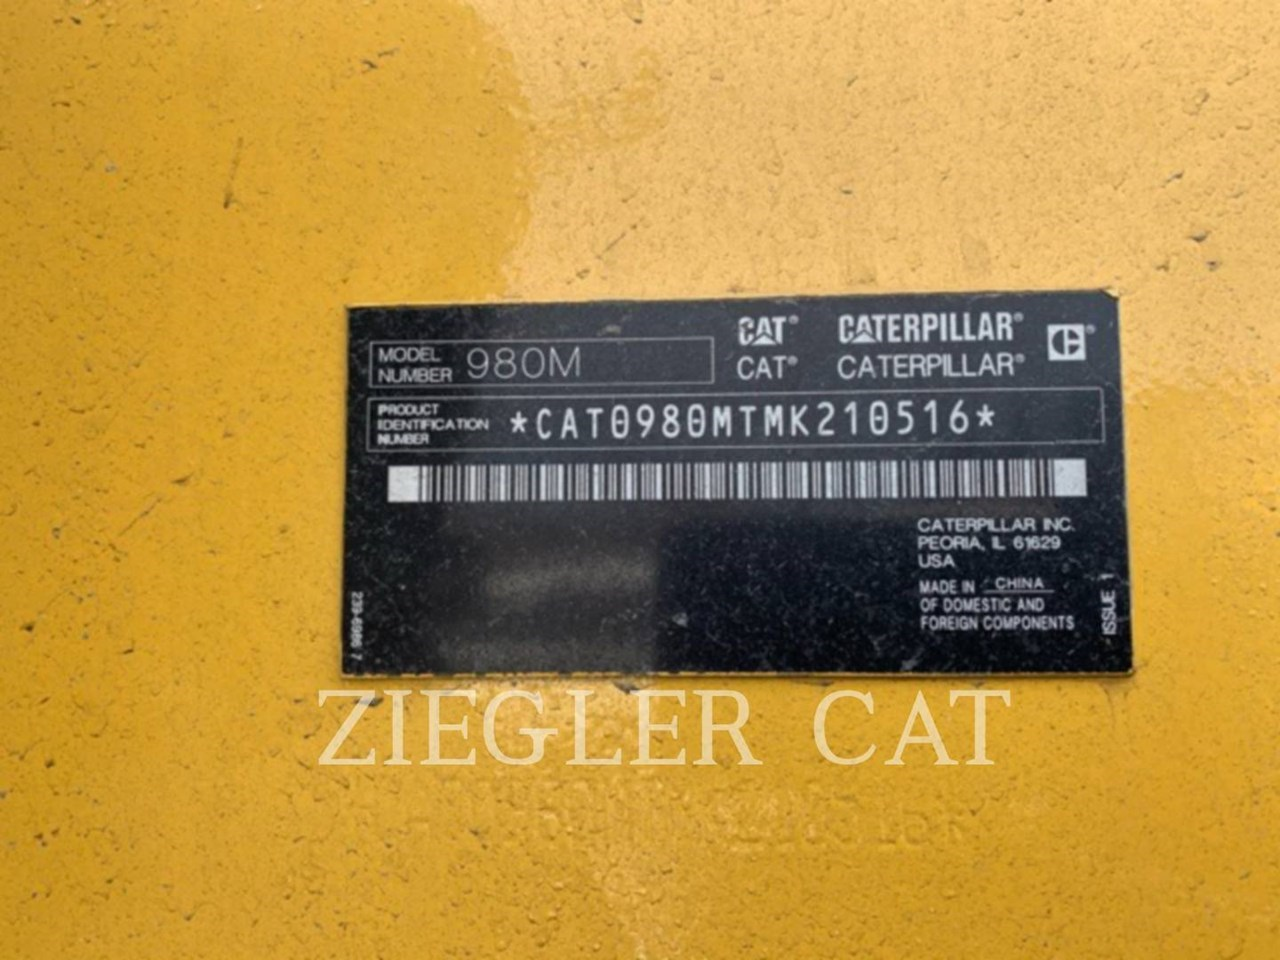 2018 Caterpillar 980M Image 5